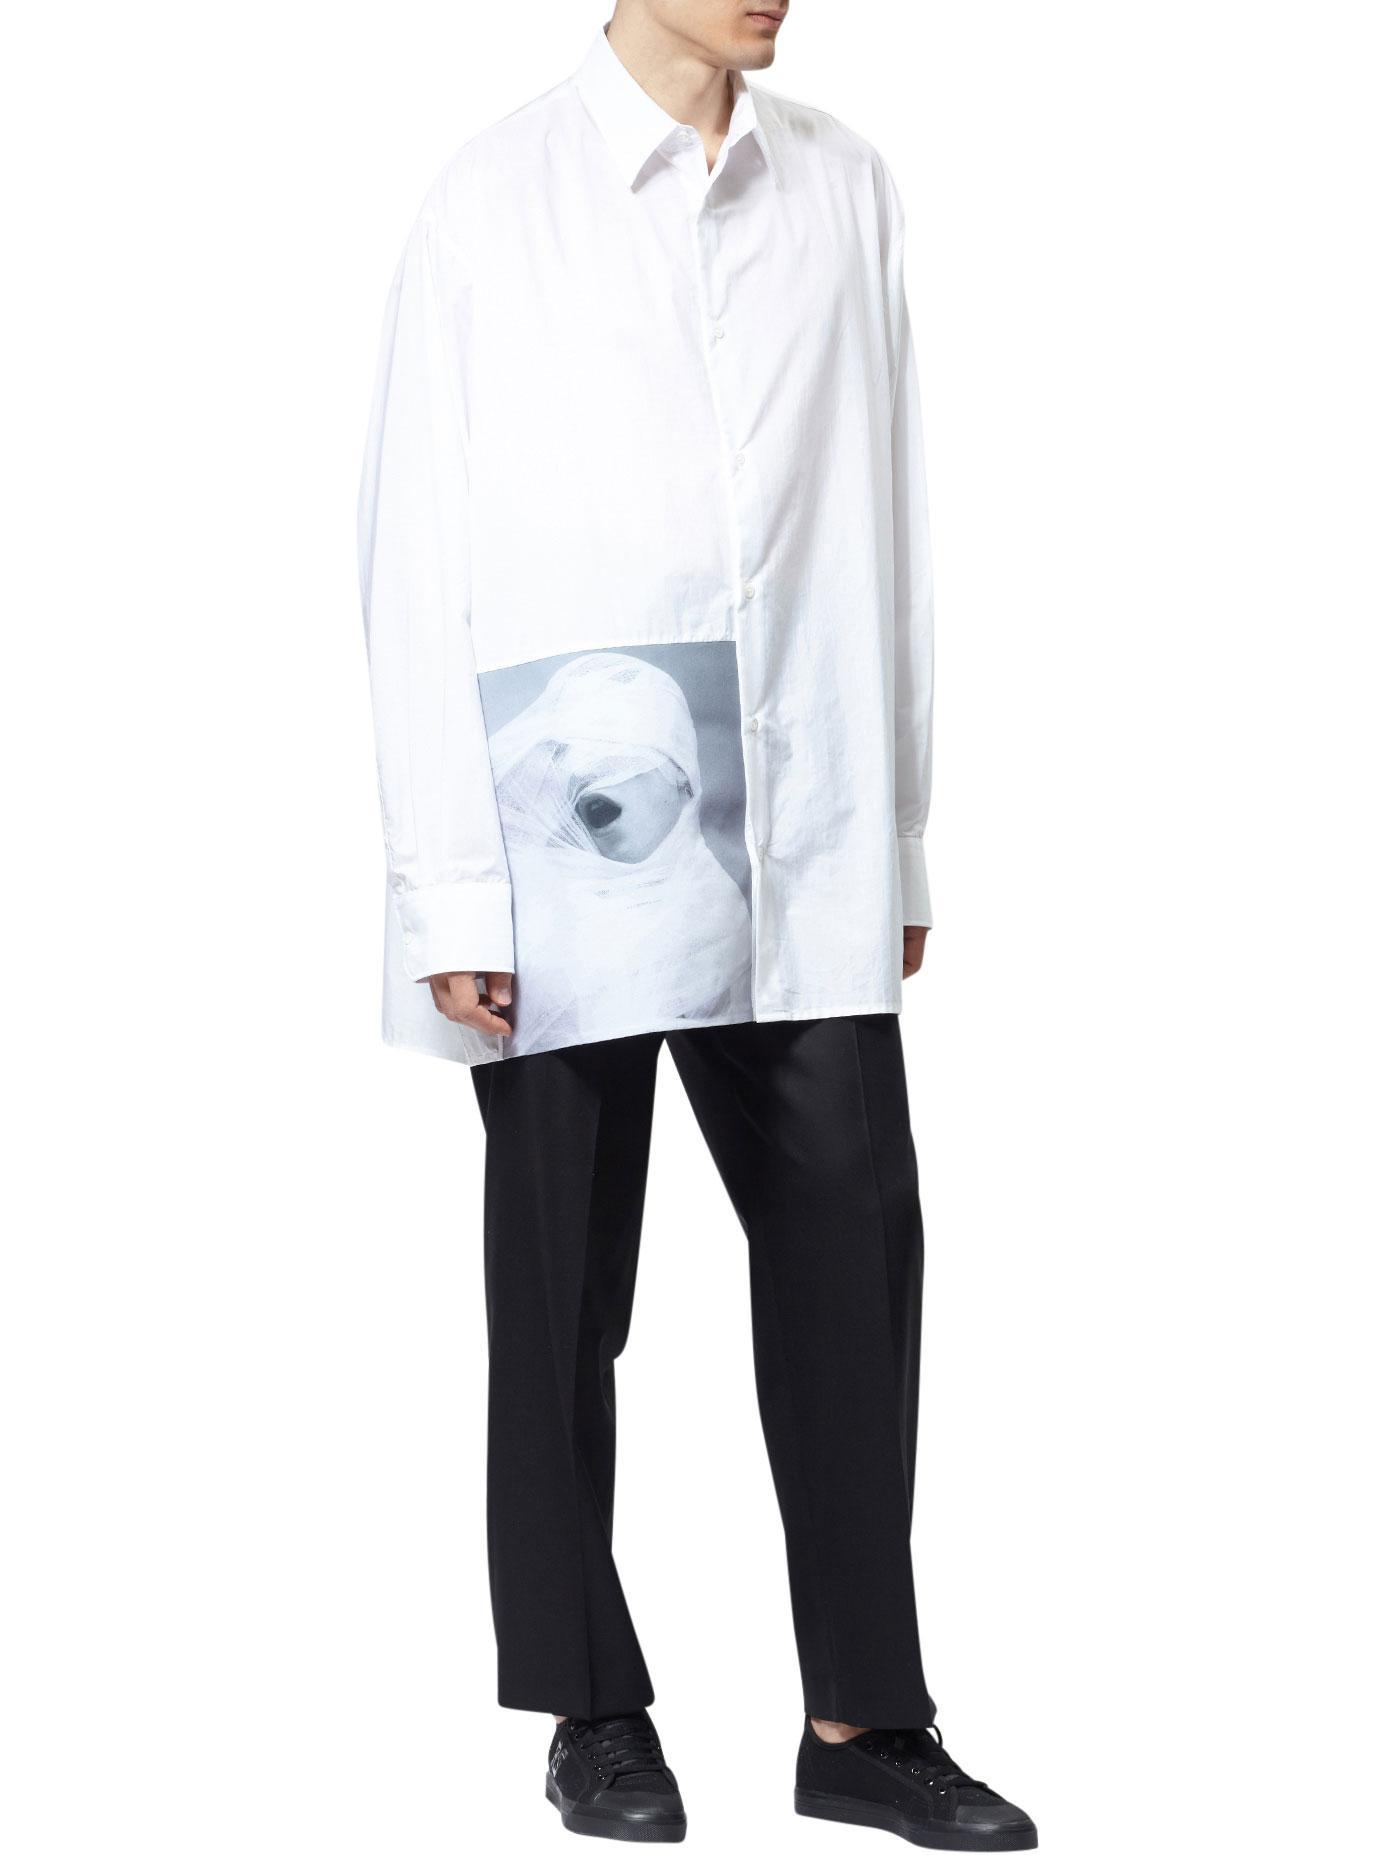 Raf simons robert mapplethorpe white gauze cotton shirt in for Raf simons robert mapplethorpe shirt